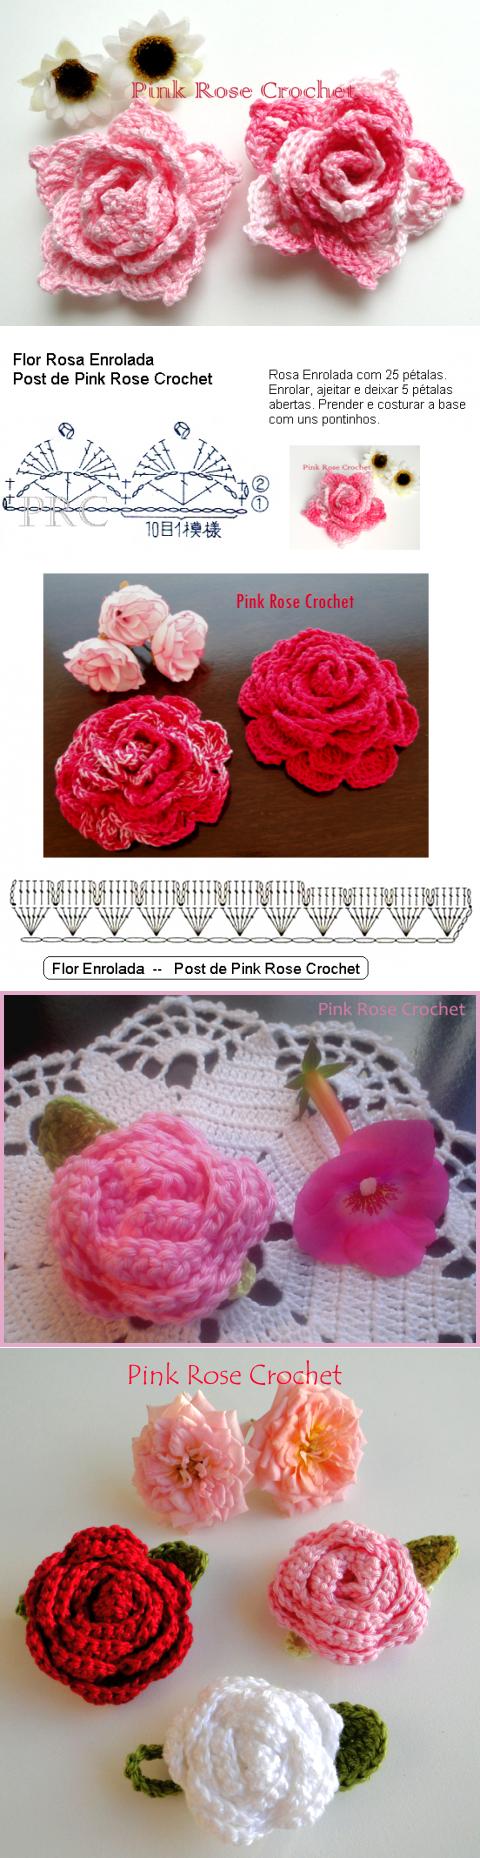 tosichka5.net.ru | Crochê | Pinterest | Flores, Ganchillo y Tejido